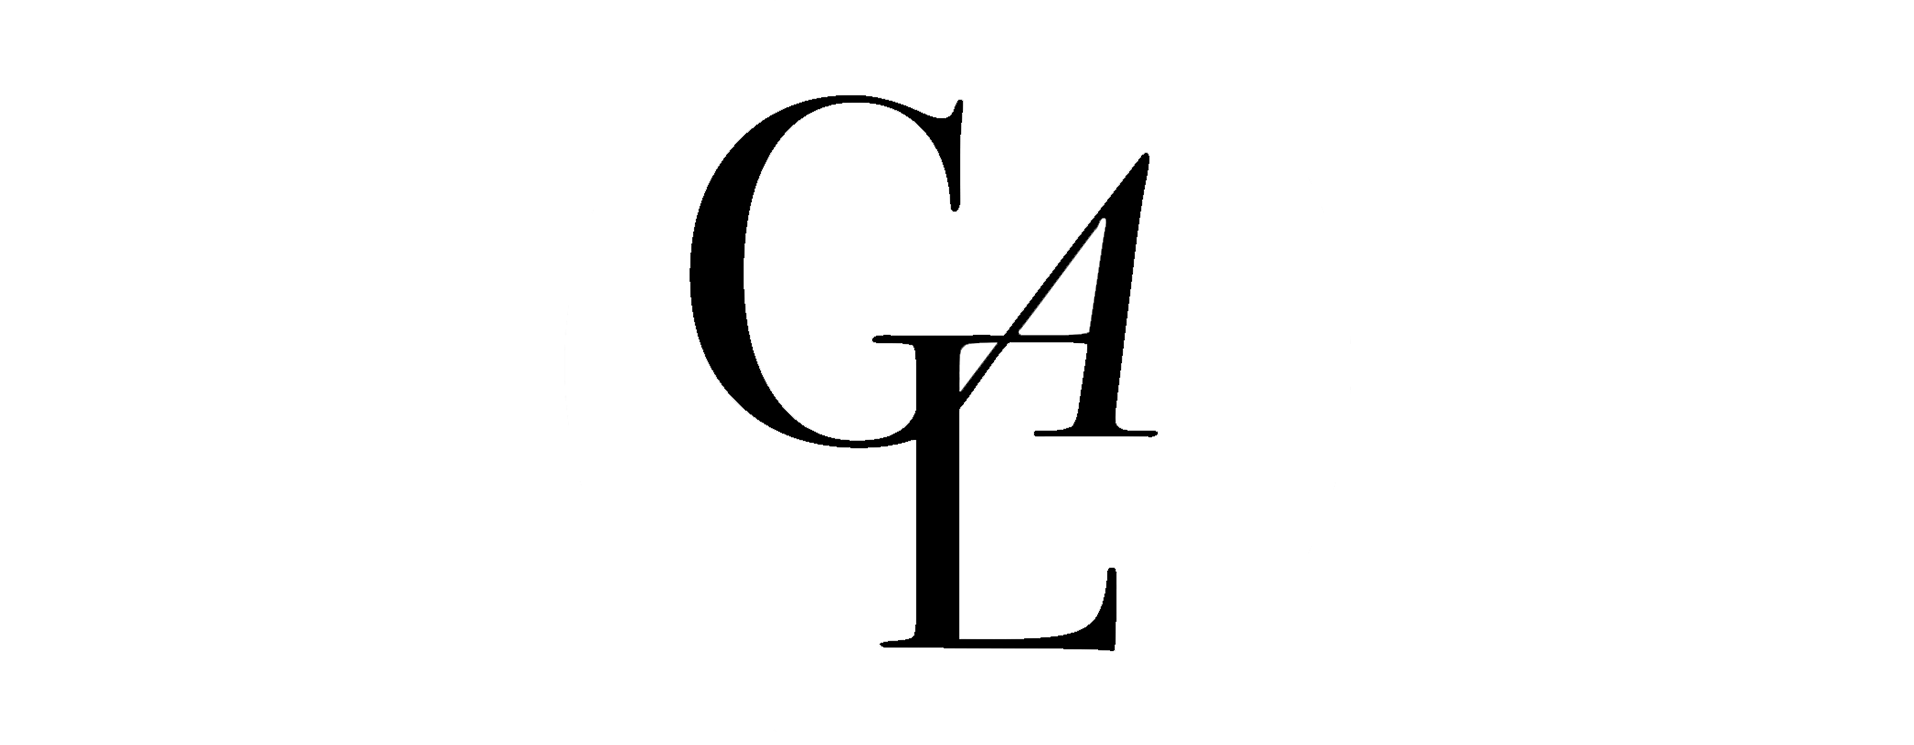 gal.png